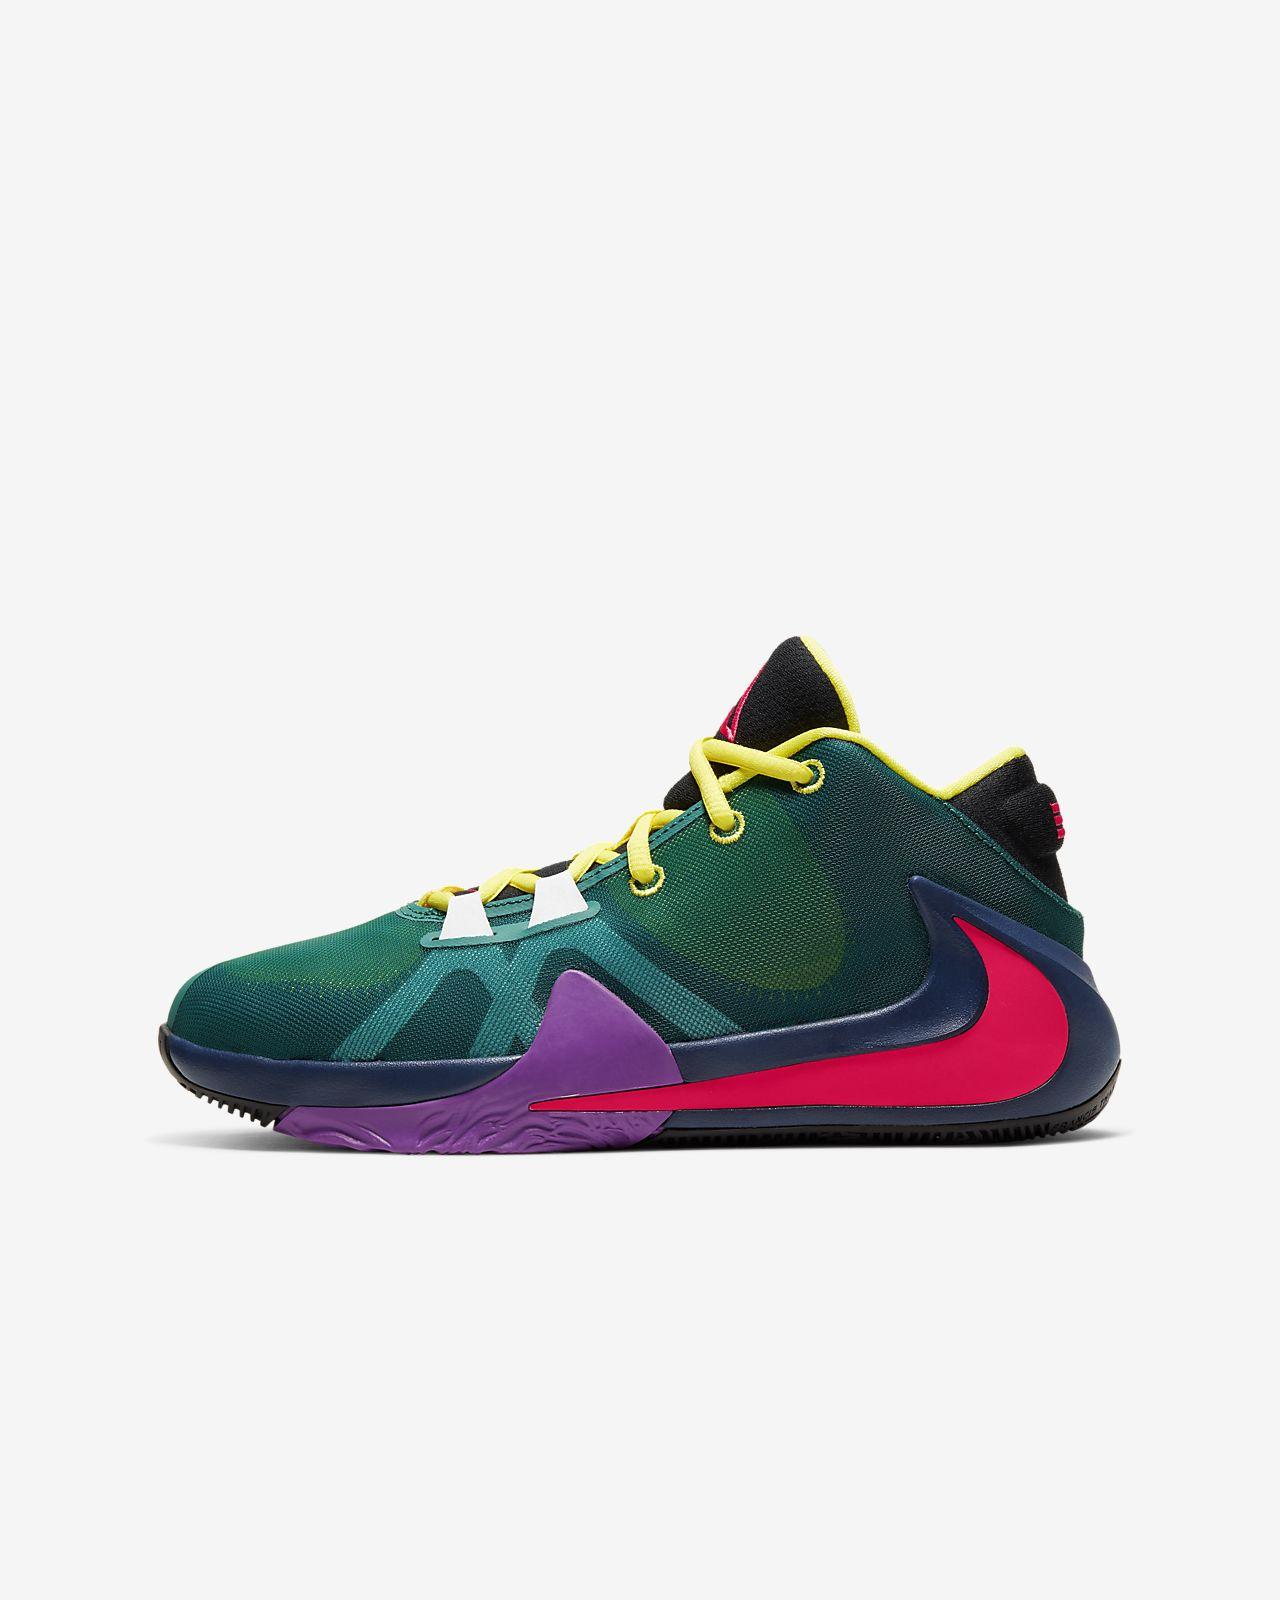 Freak 1 1/2 Older Kids' (Boys') Basketball Shoe